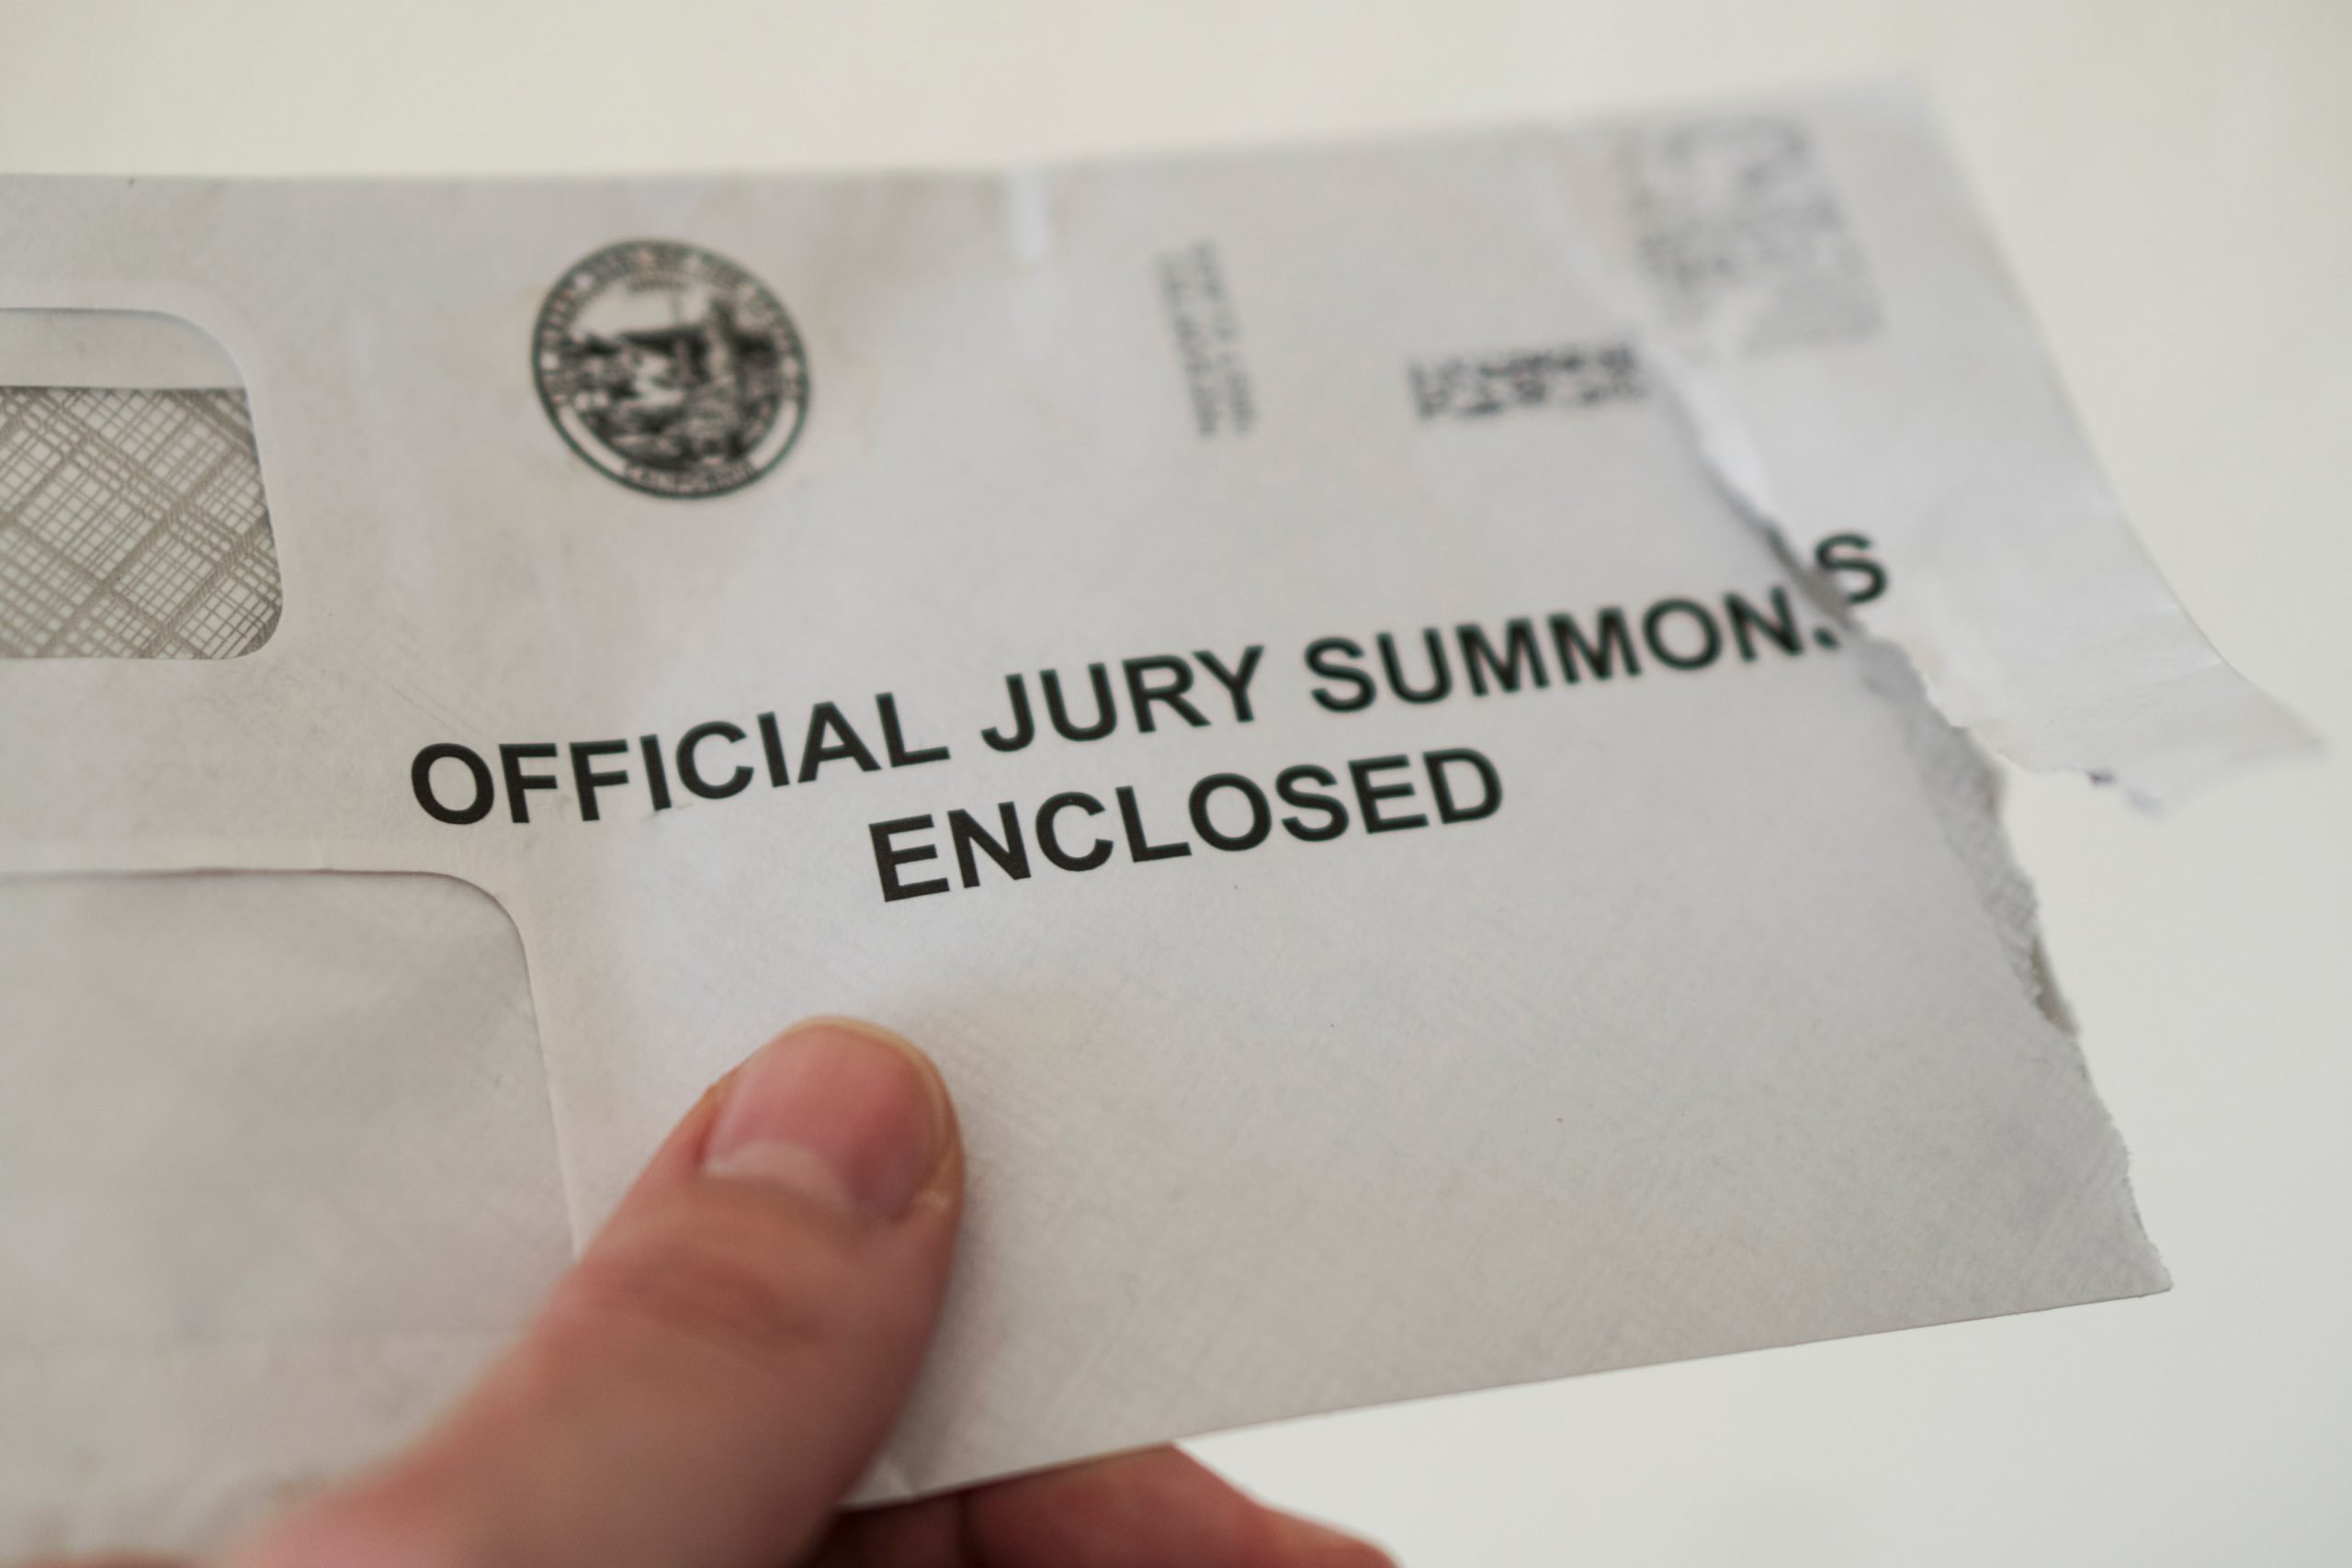 Jury Selection Duty summons